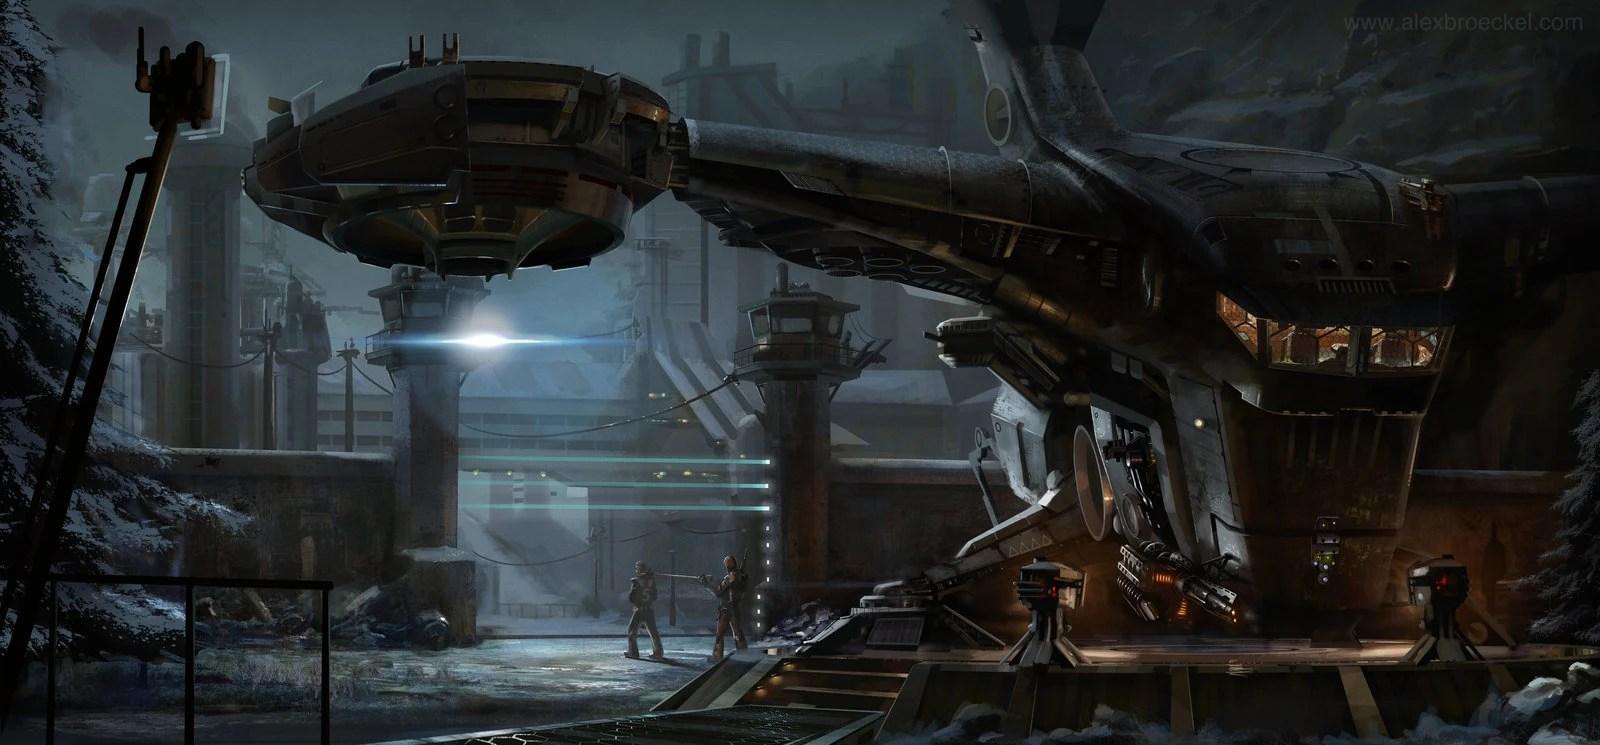 Black Lab Fall Wallpaper Enforcer Class Patrol Craft Star Wars Exodus Visual